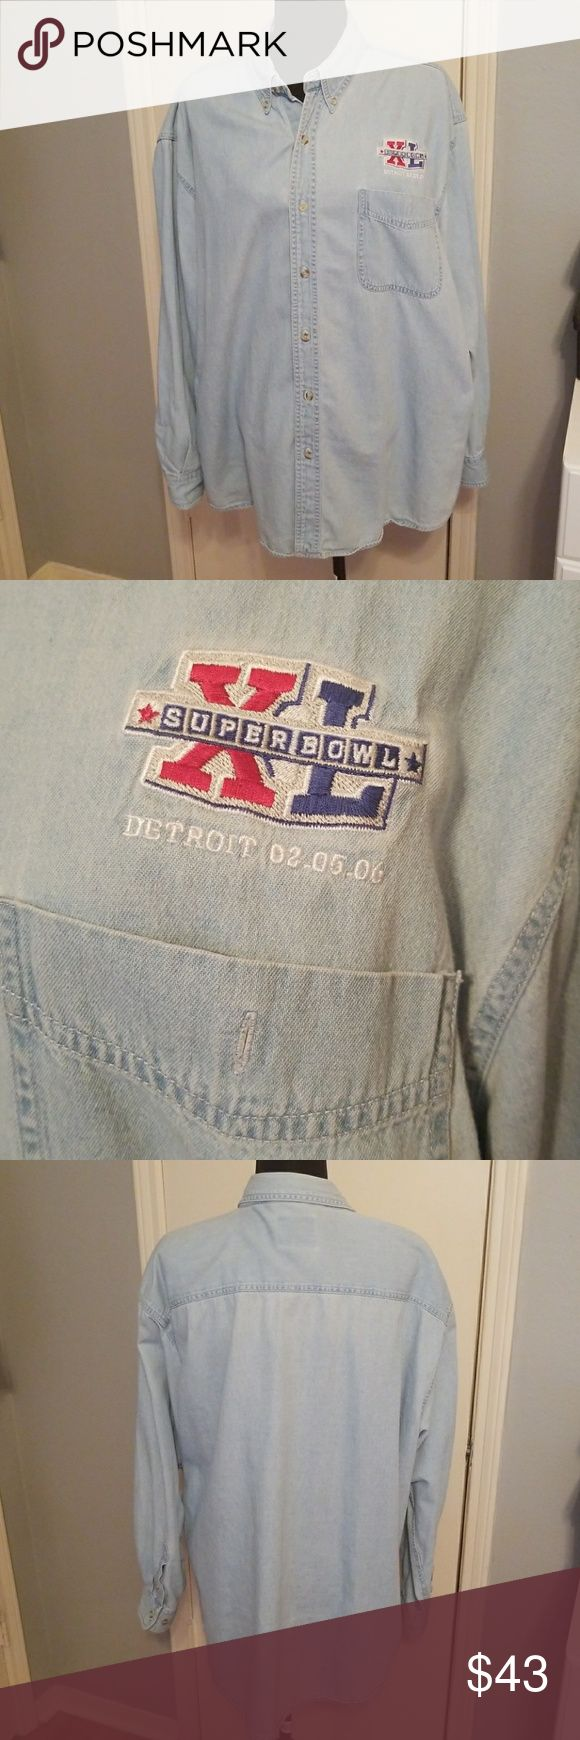 "2006 Super Bowl Denim Shirt Authentic NFL 2006 XL Super Bowl Faded Denim button down Shirt. Embroidered ""Super Bowl XL Detroit 02.05.06"" over chest pocket. Long sleeves, size XL. Great shape. NFL Shirts Casual Button Down Shirts"